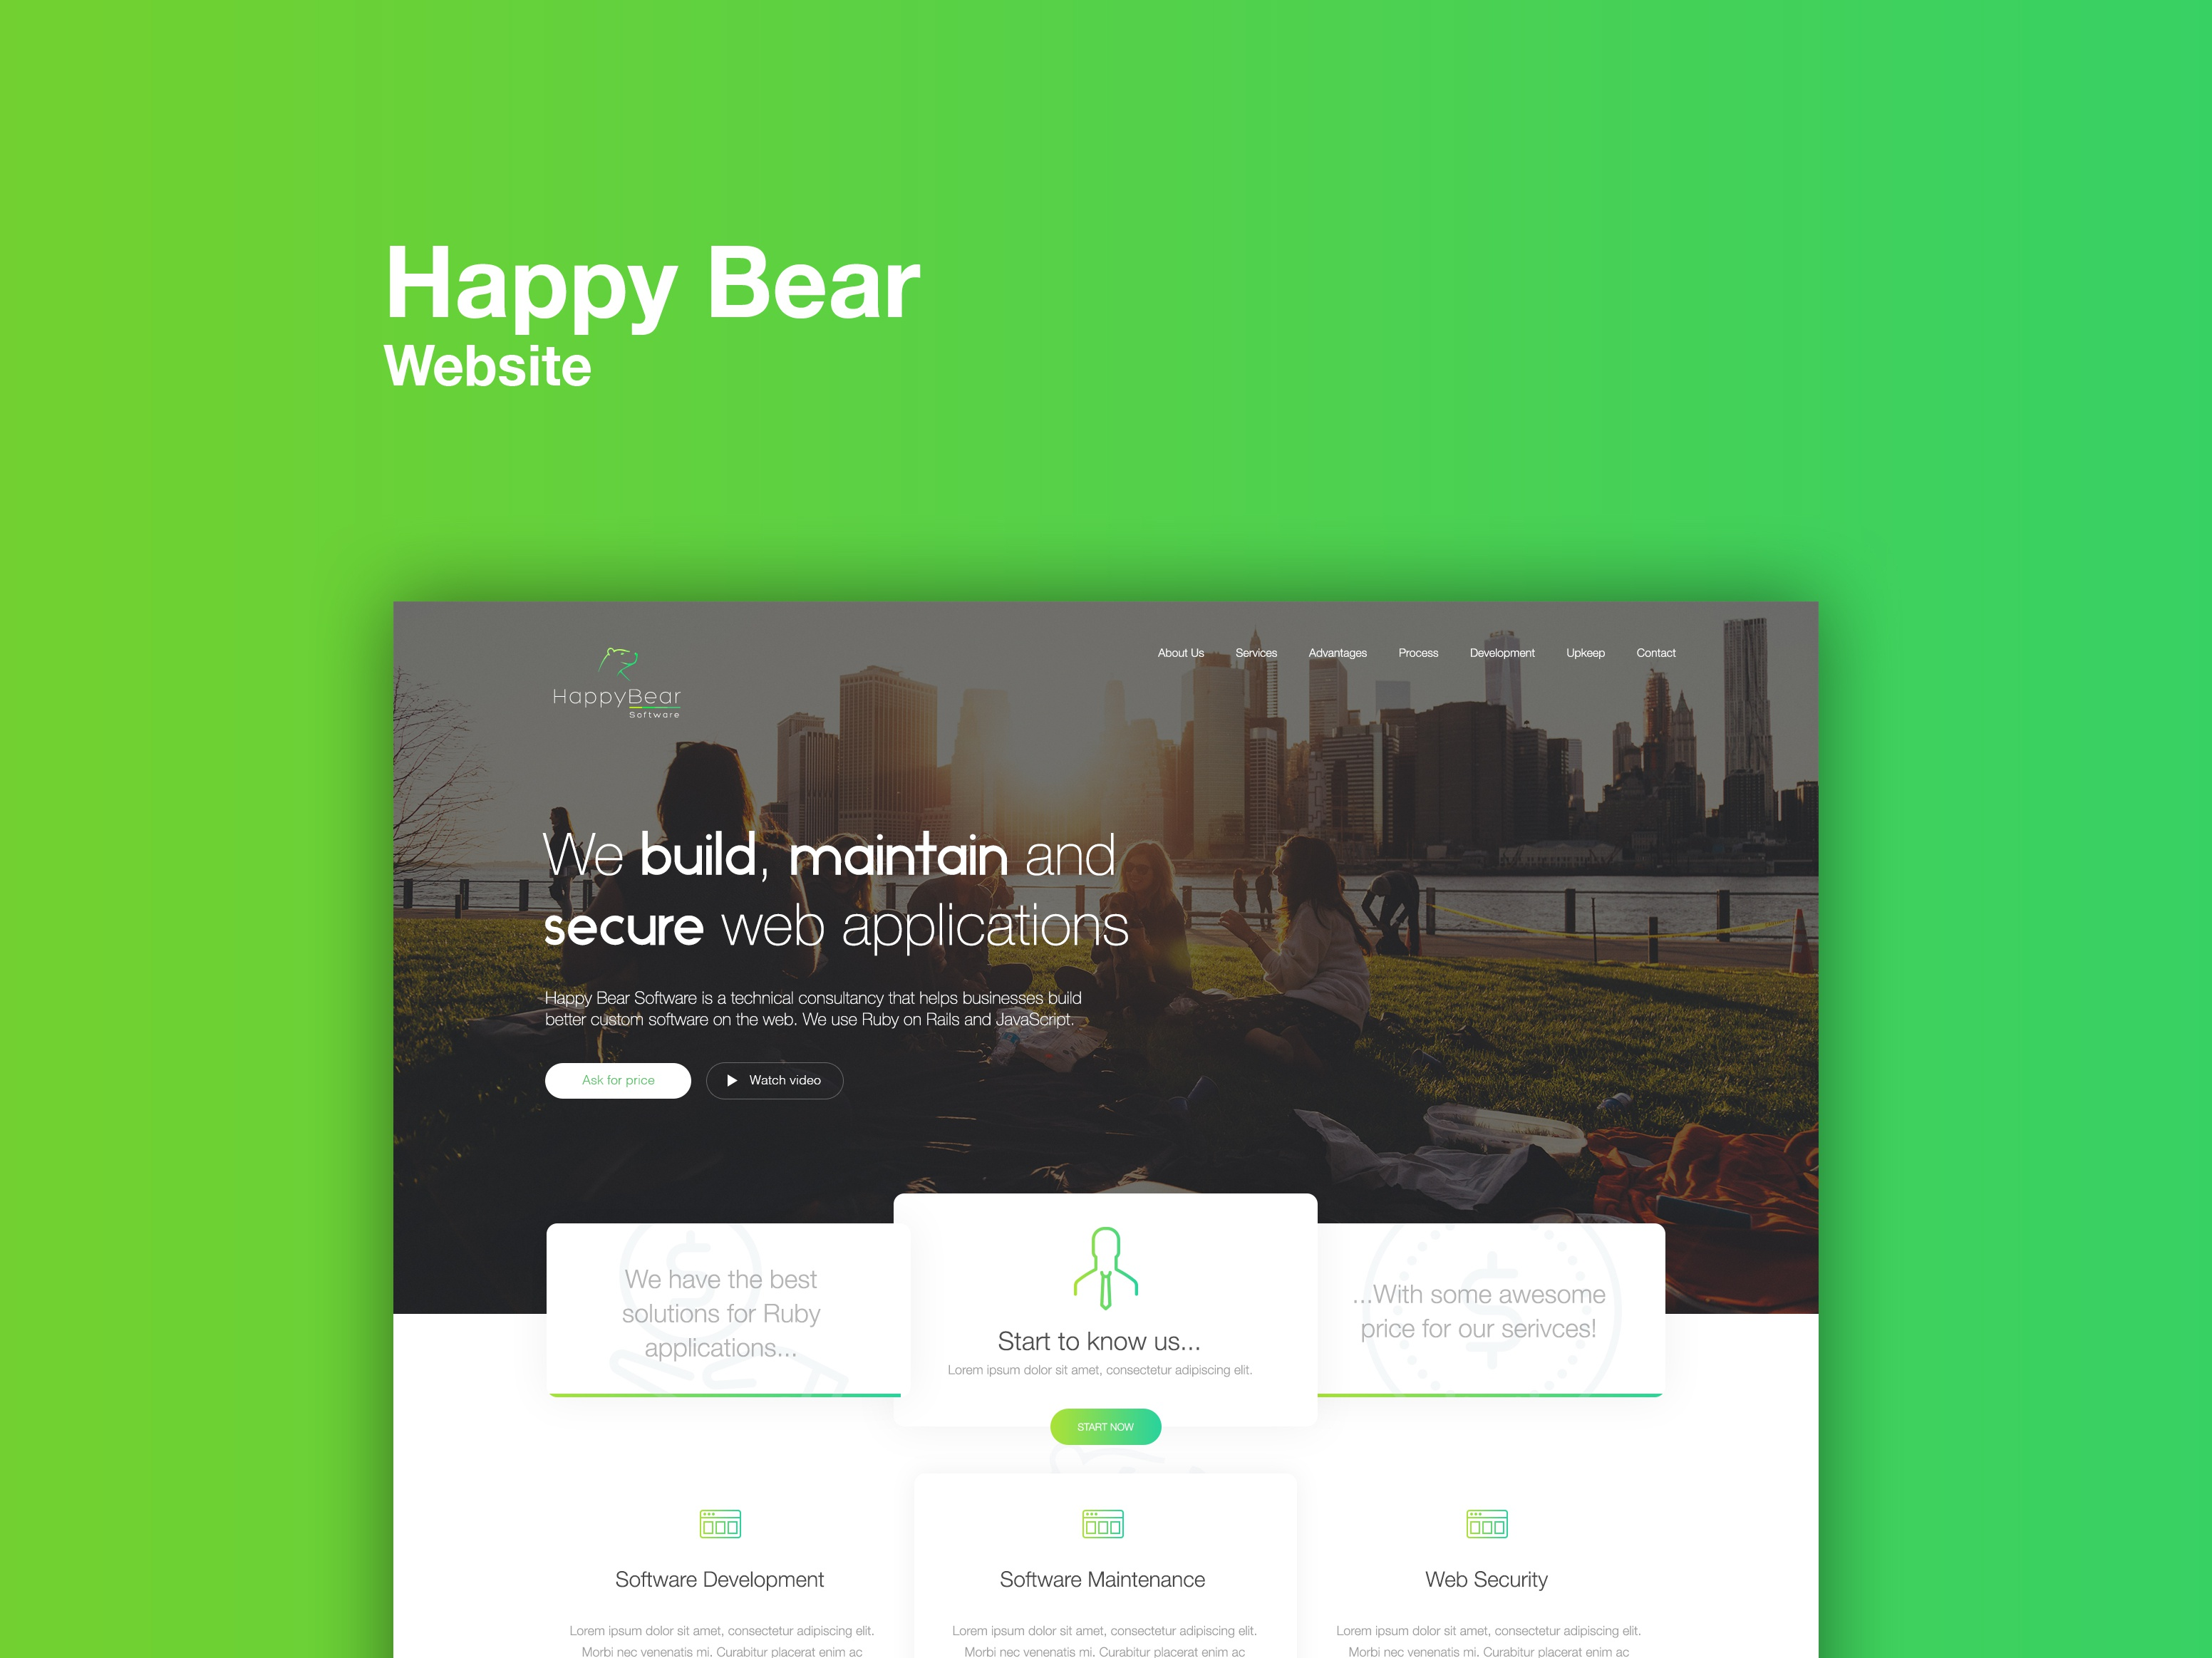 Happy bear website